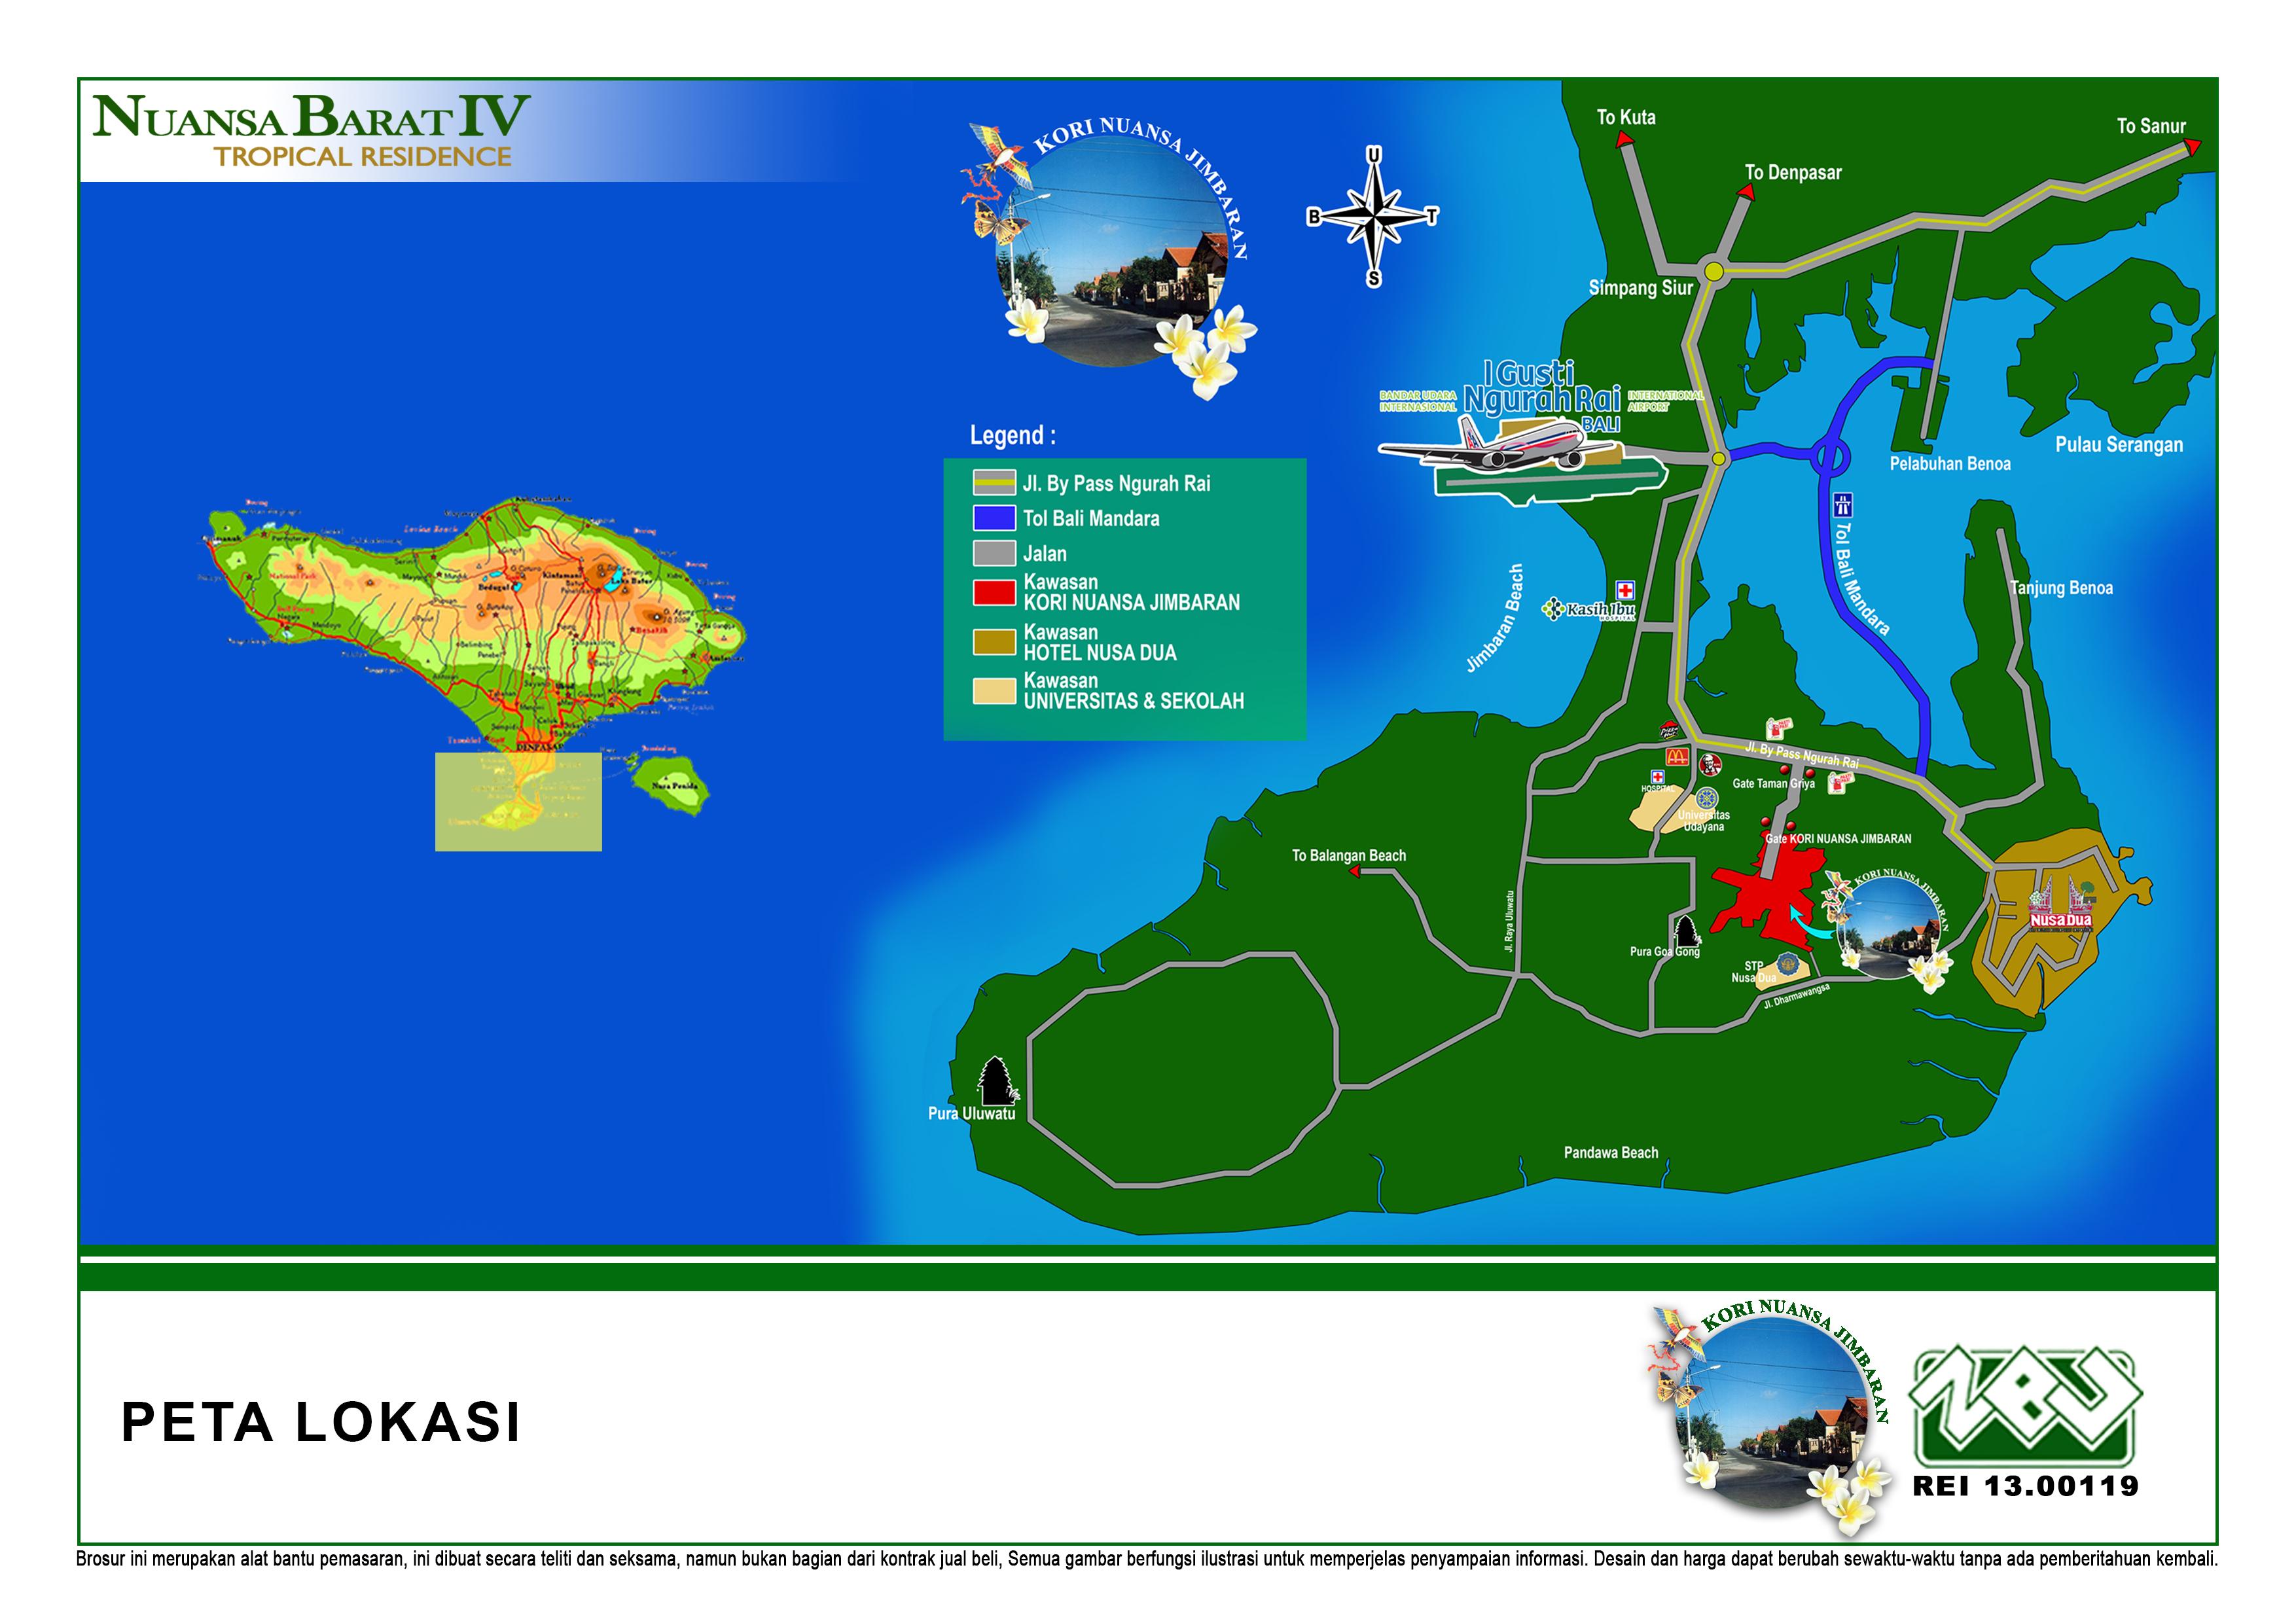 Nuansa Barat IV - PT. Nuansa Bali Utama